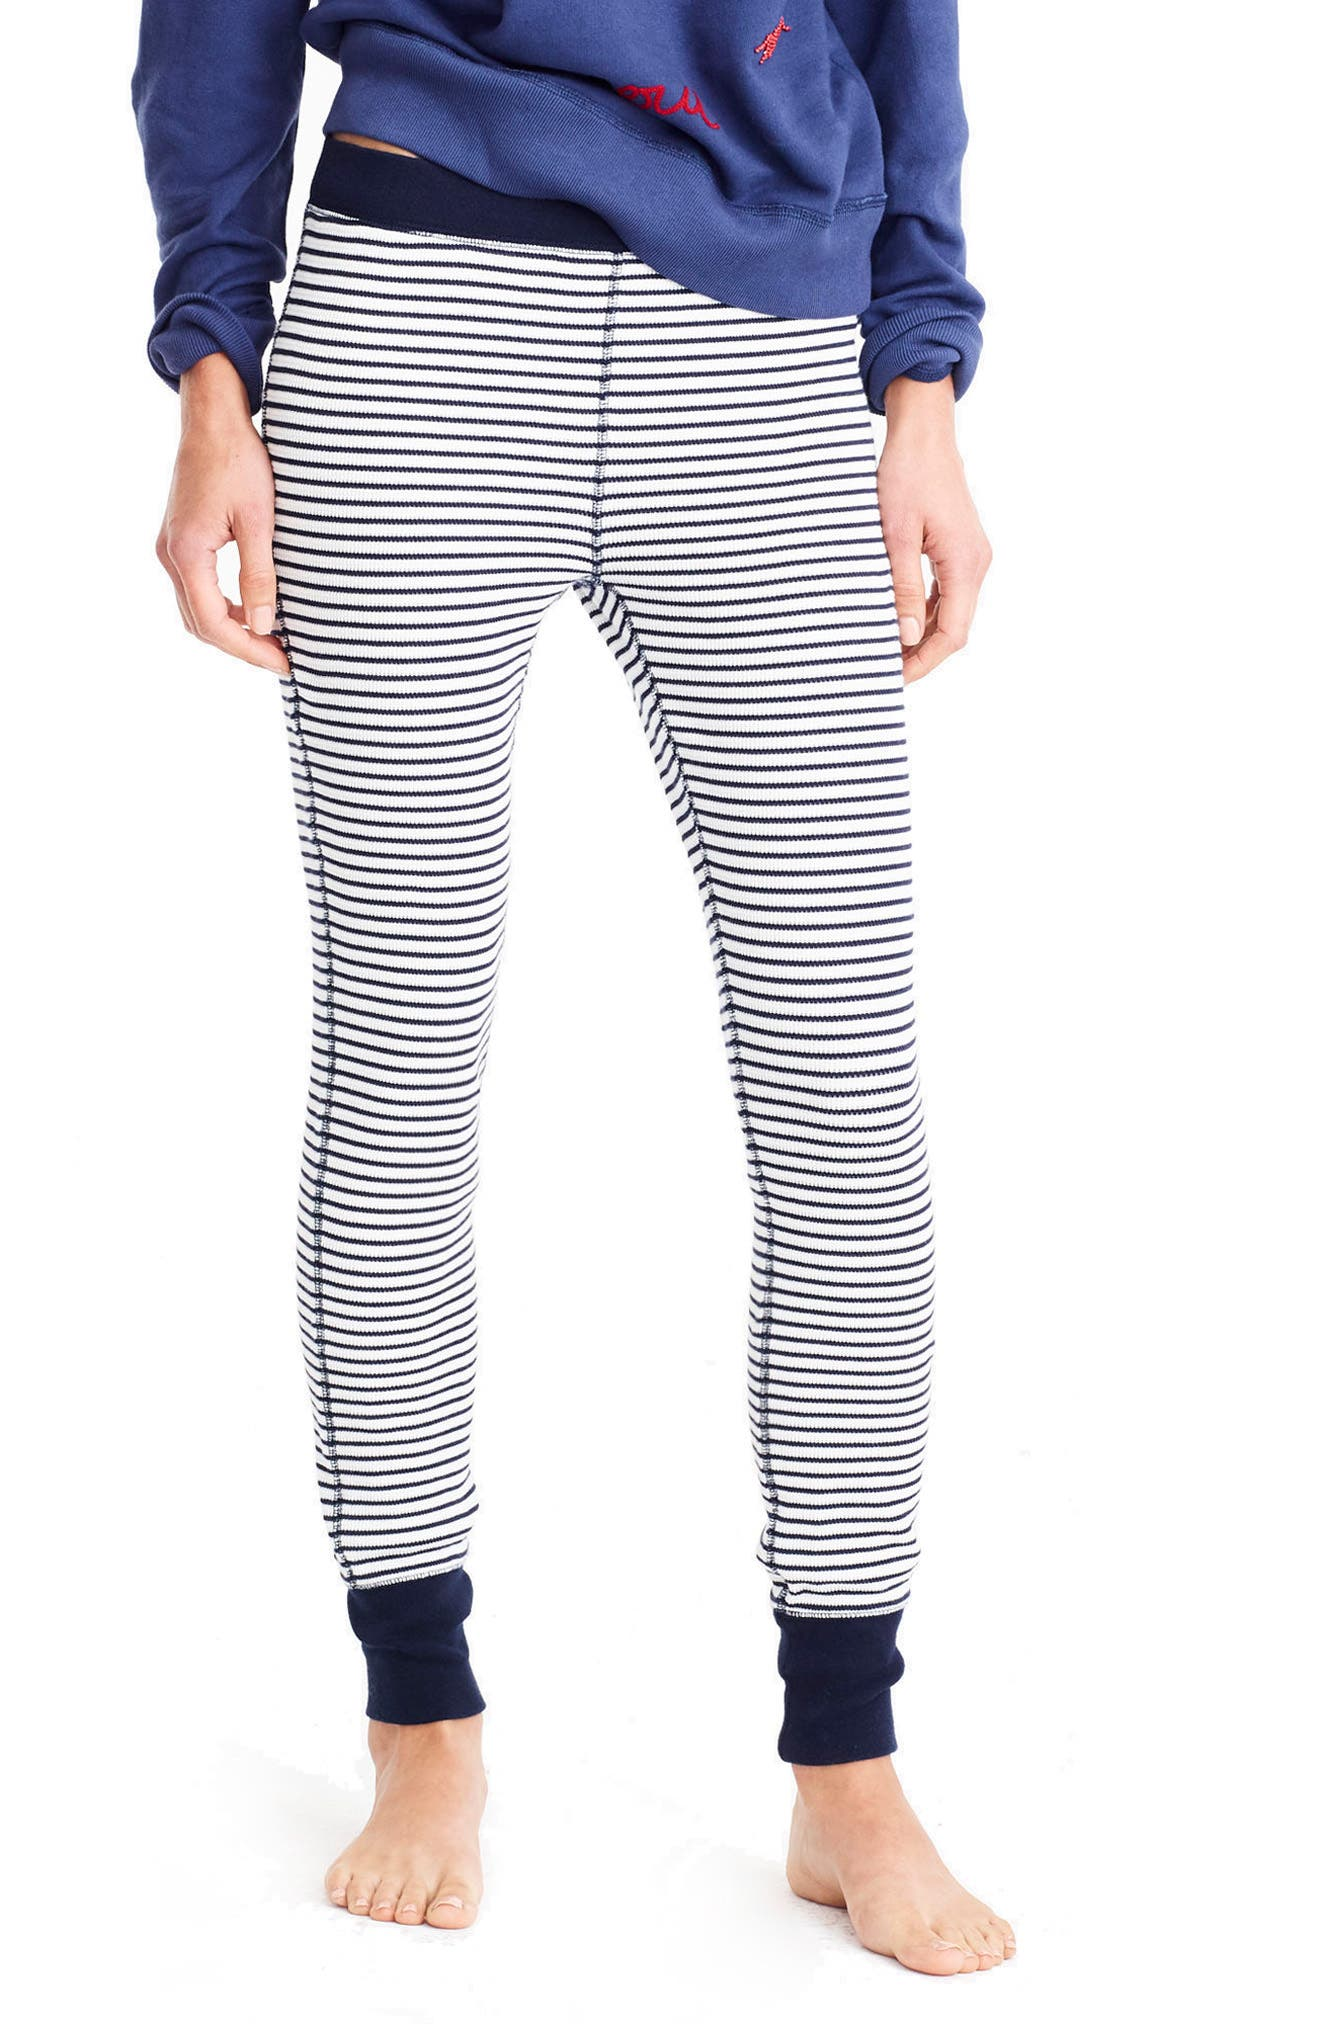 Waffle Knit Leggings,                         Main,                         color, 400